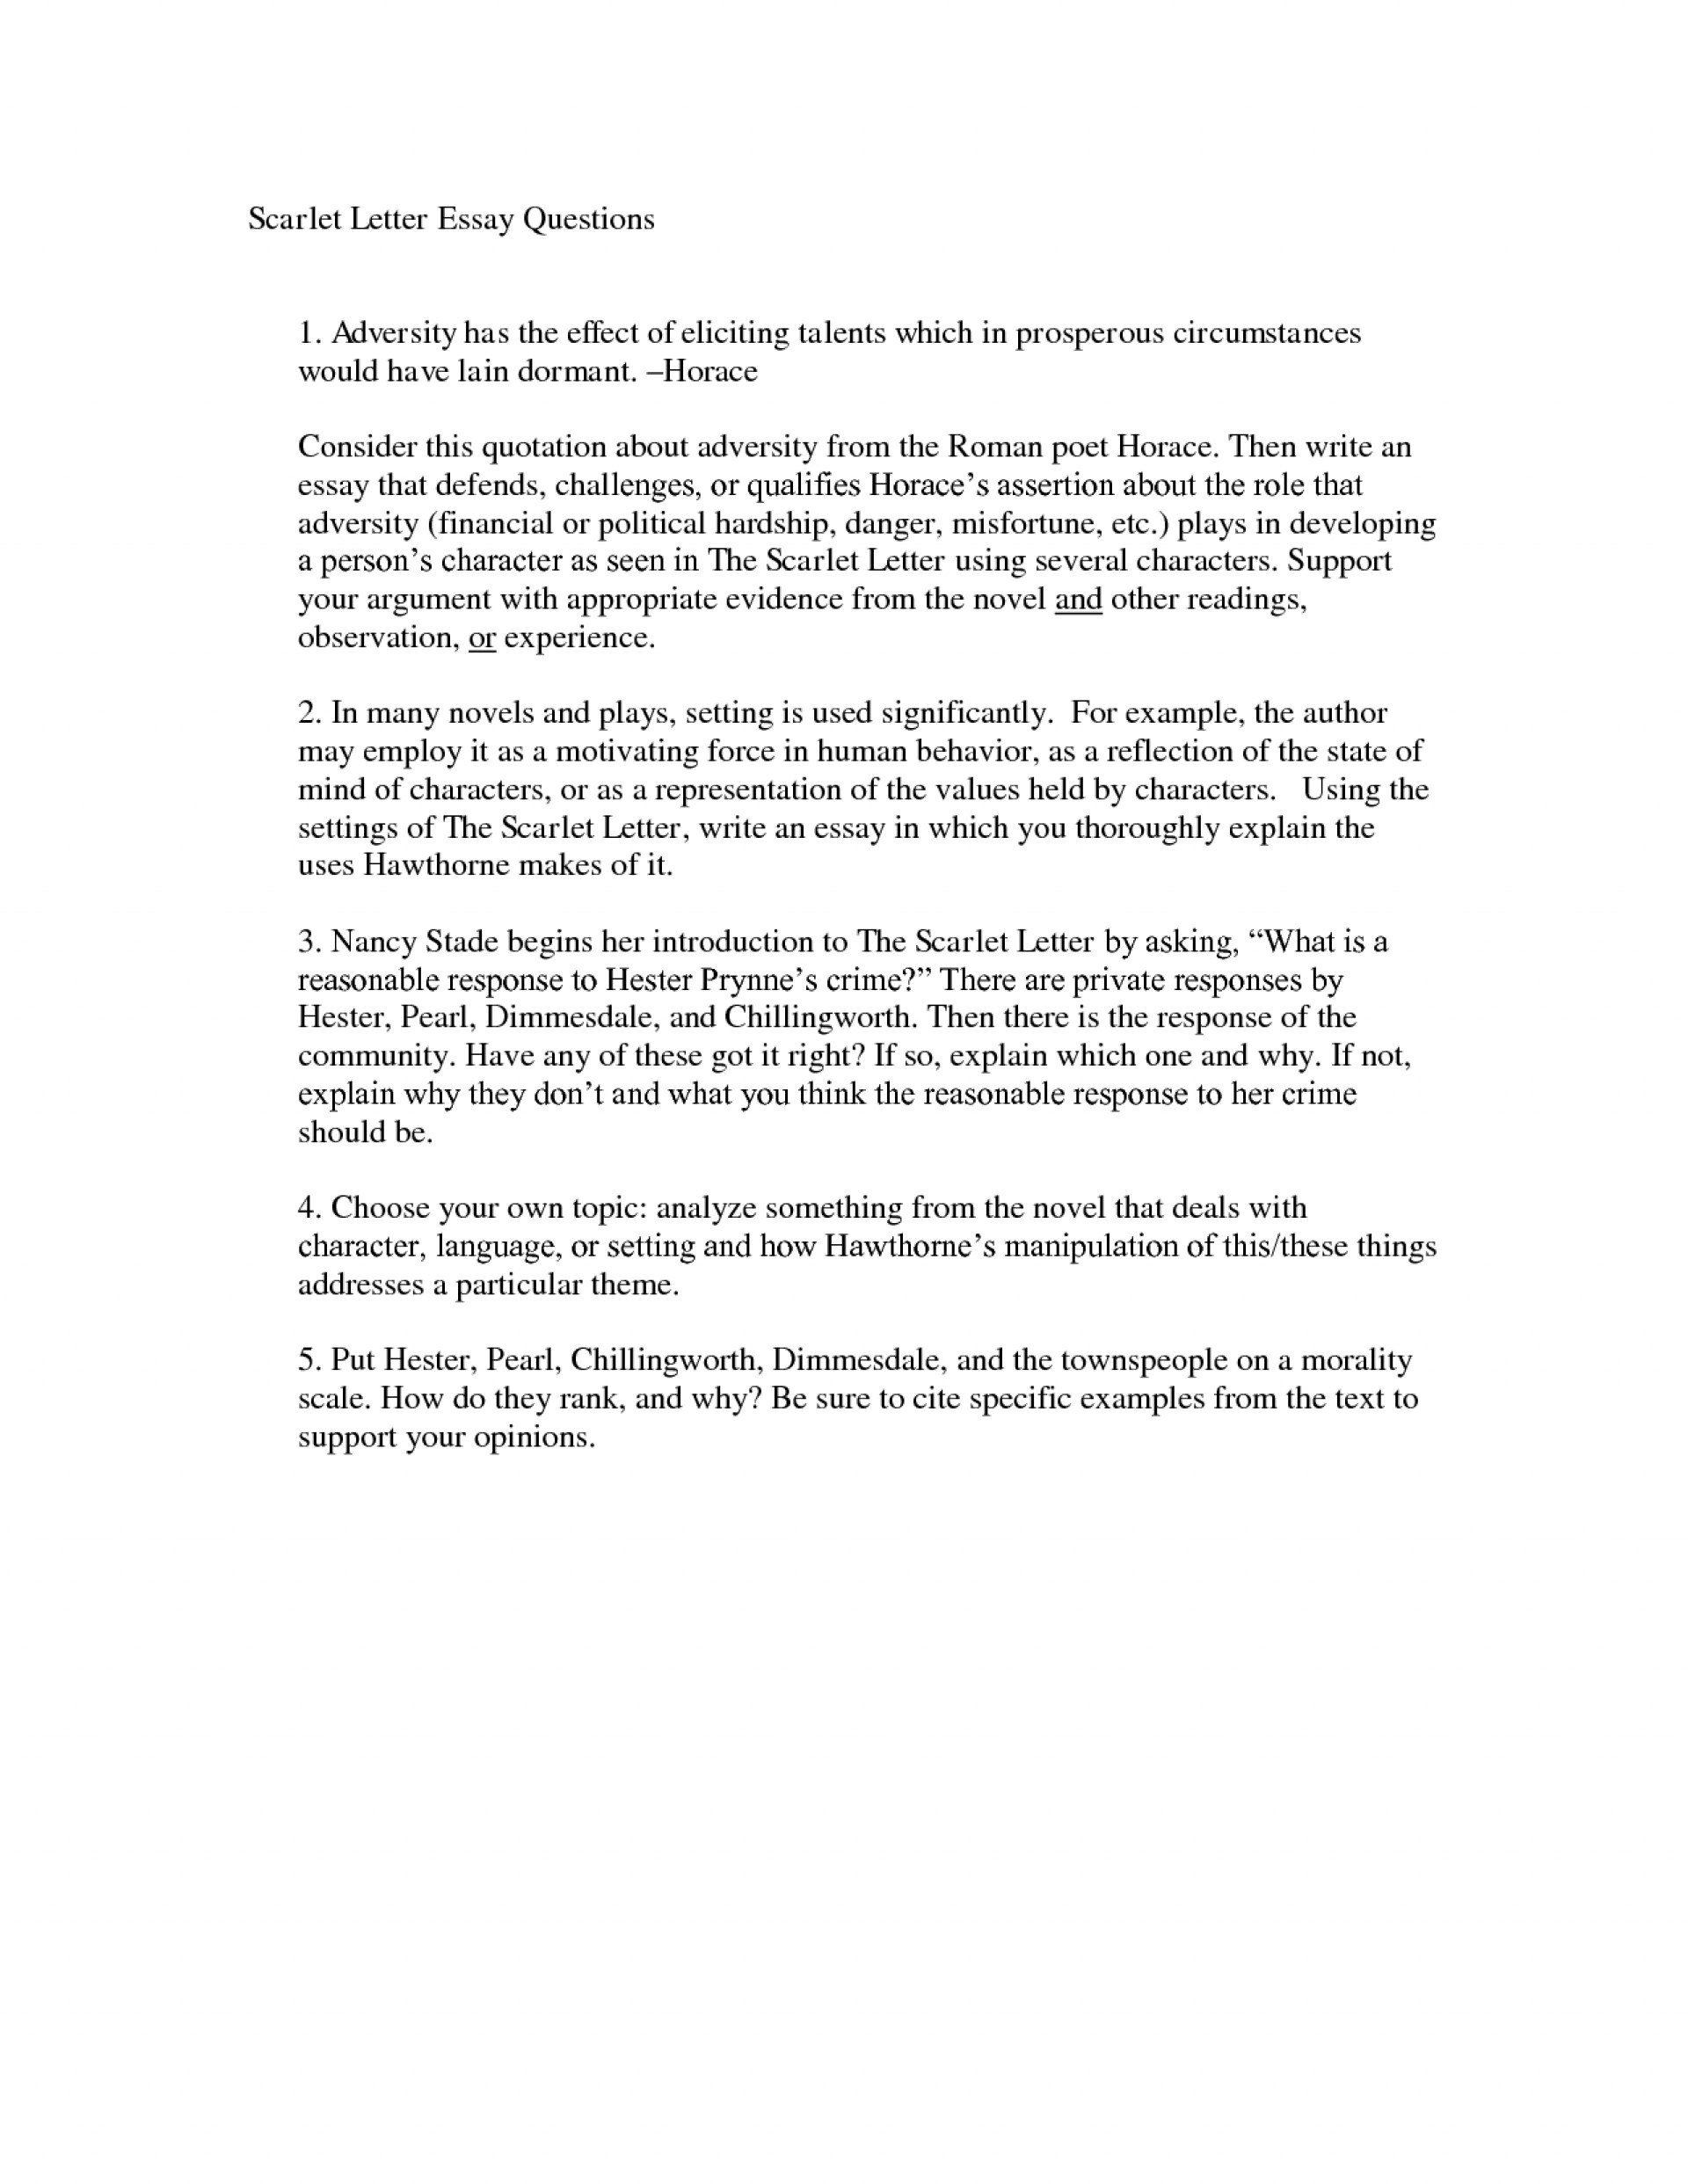 005 Scarlet Letter Essay Imposing Titles On Sin Pdf 1920